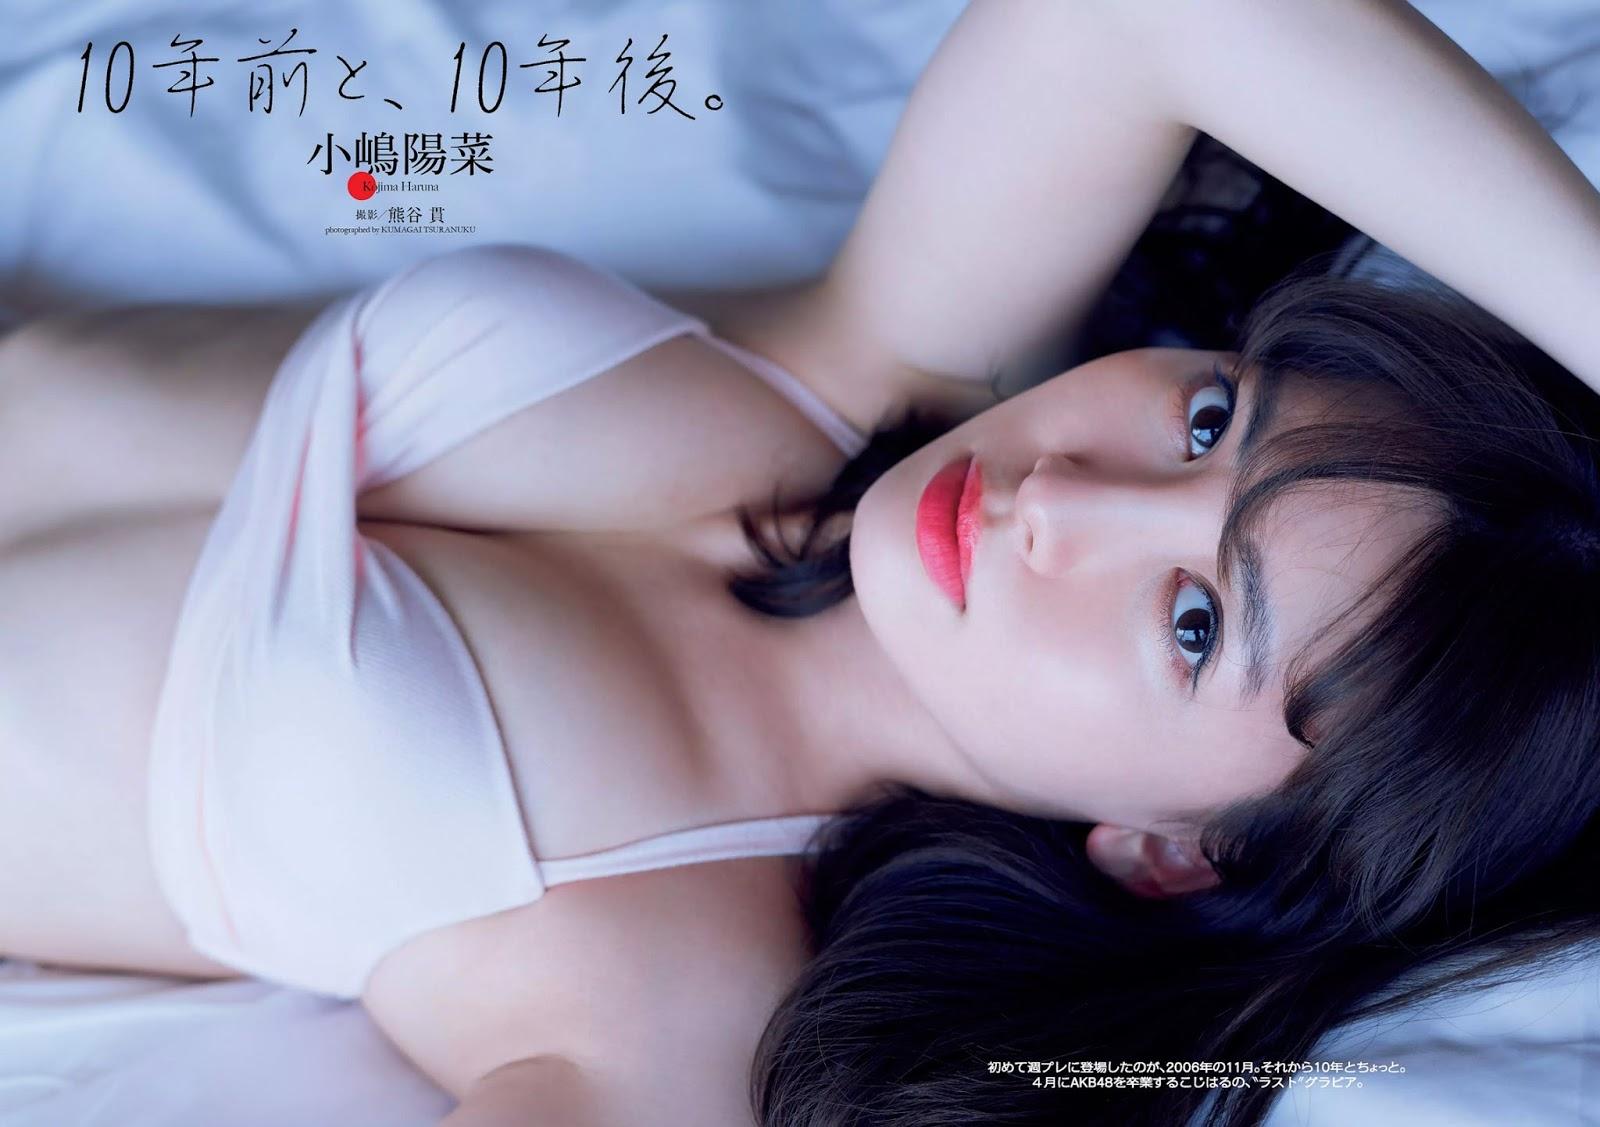 Kojima Haruna 小嶋陽菜 AKB48, Weekly Playboy 2017.04.17 No.16 (週刊プレイボーイ 2017年16号)